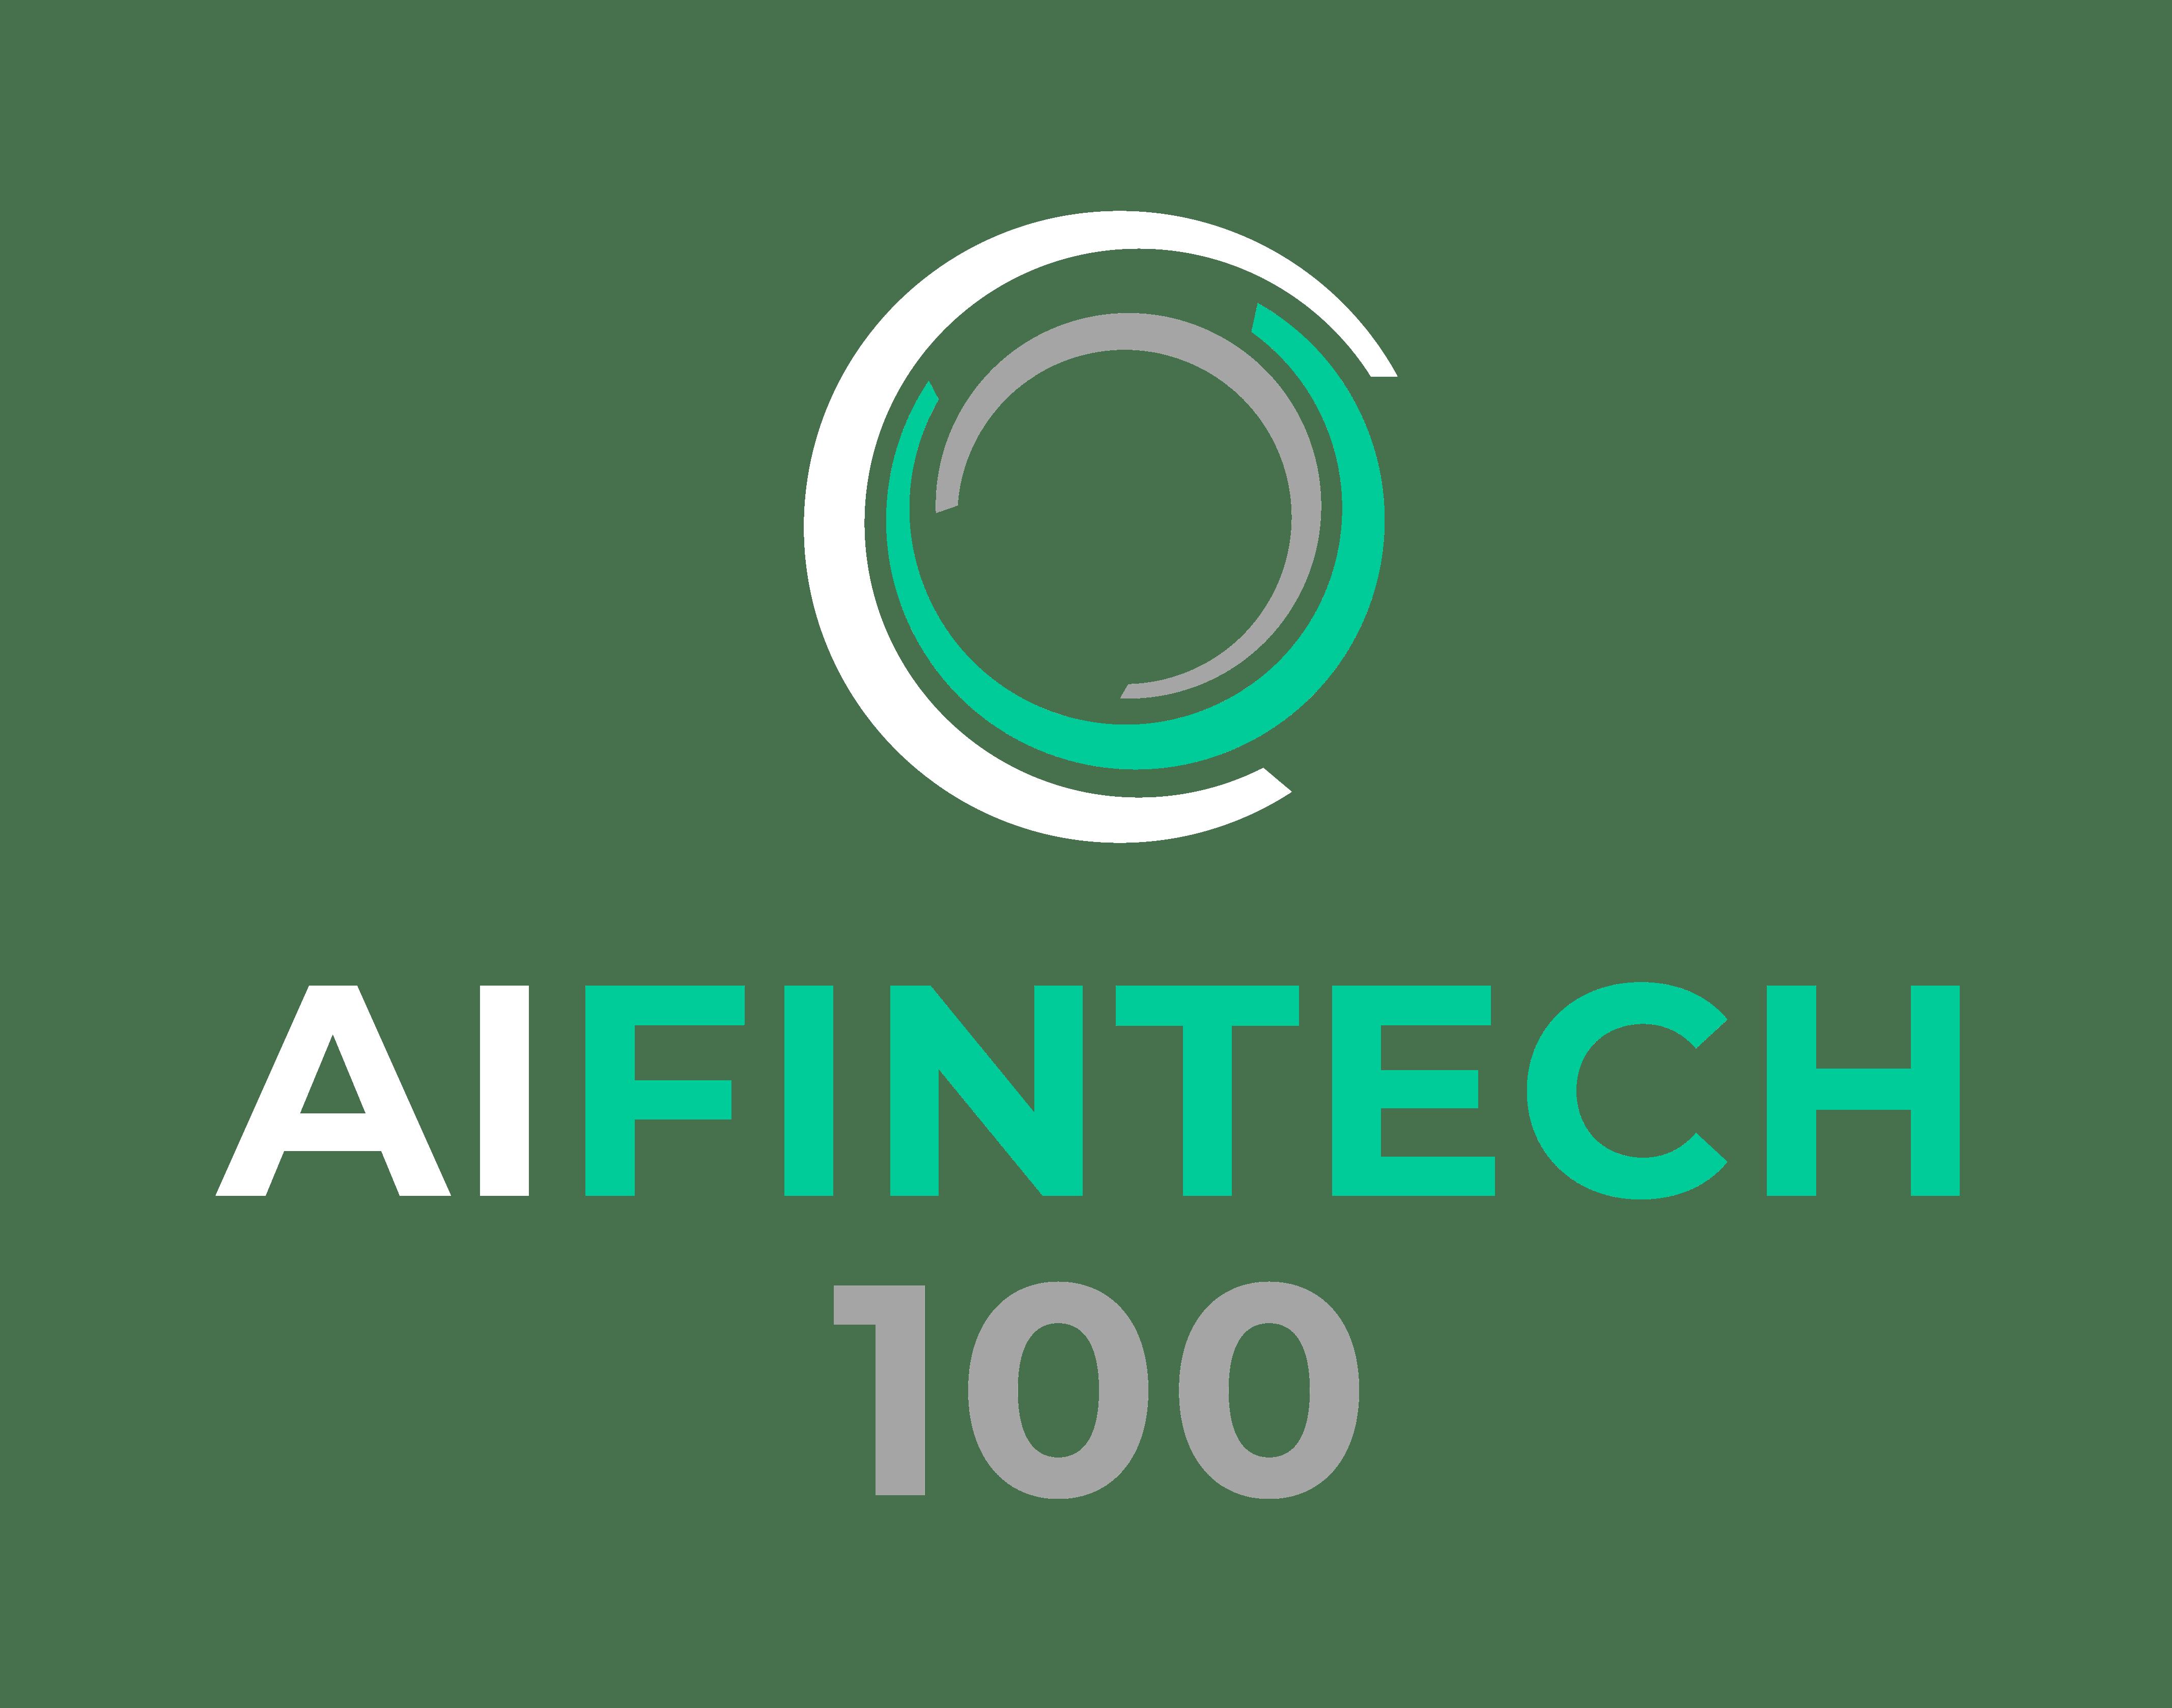 SaffronBlue.aiPermutable shortlisted for AI FinTech 100 Awards